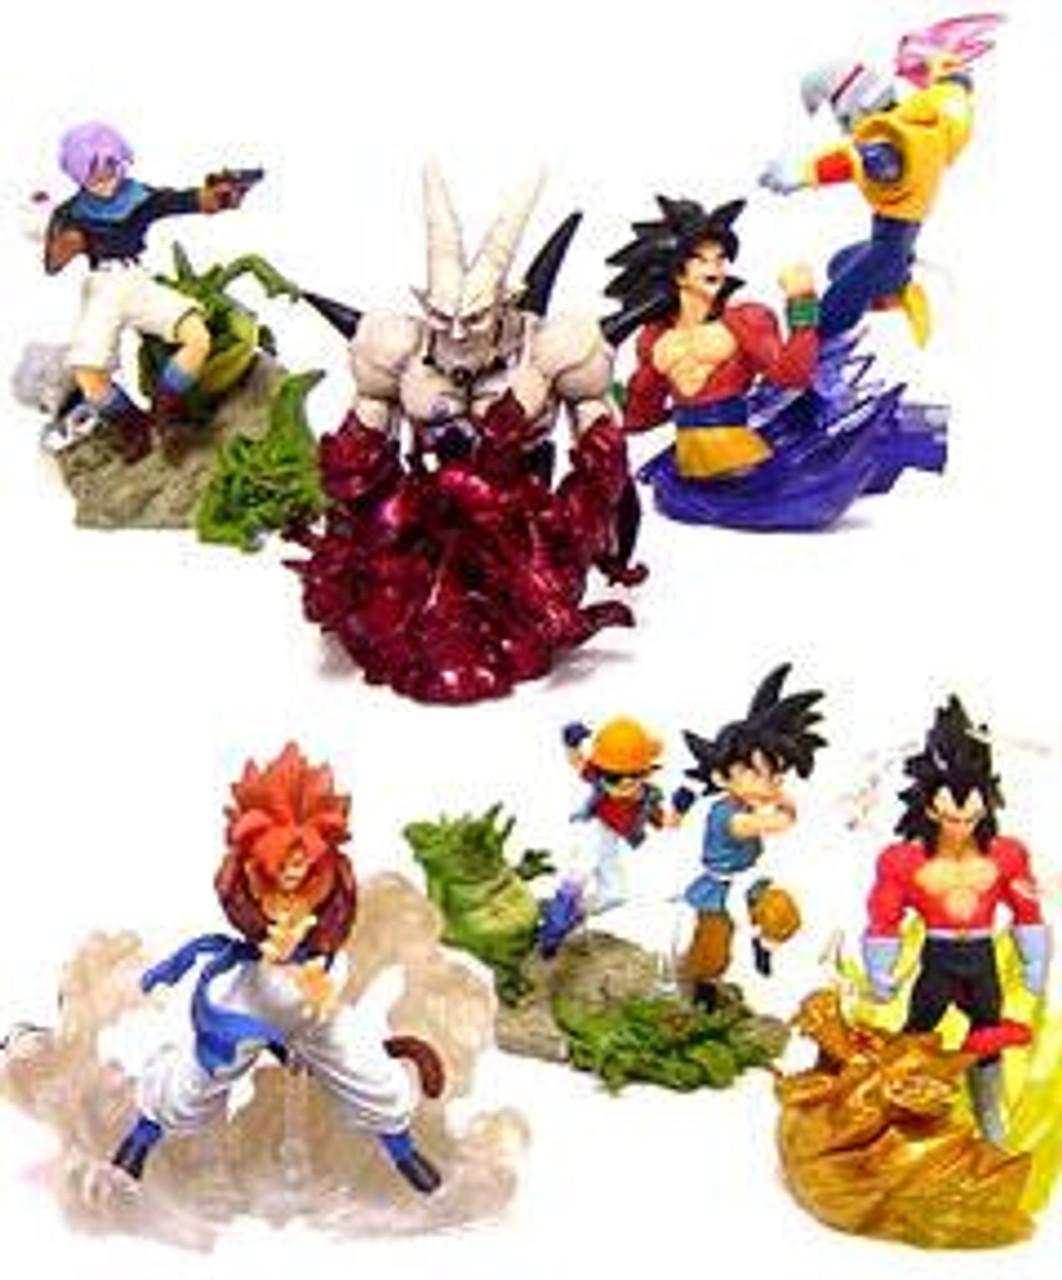 Dragon Ball GT Battle Scenes Set of 6 3.5-Inch PVC Figures